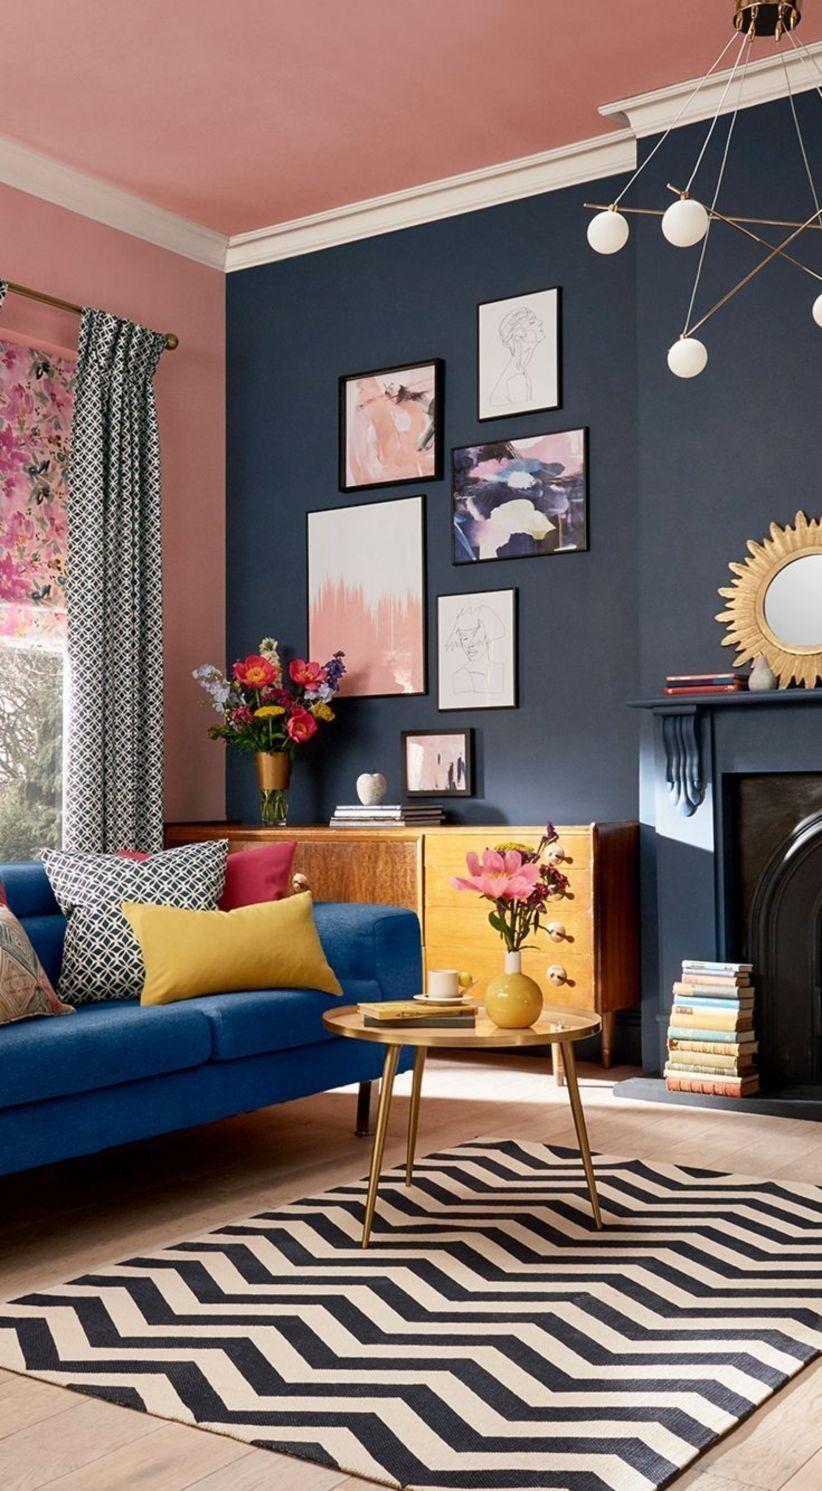 12 Most Stunning Living Room Color Palette Ideas Color Palette Living Room Living Room Designs Living Room Decor